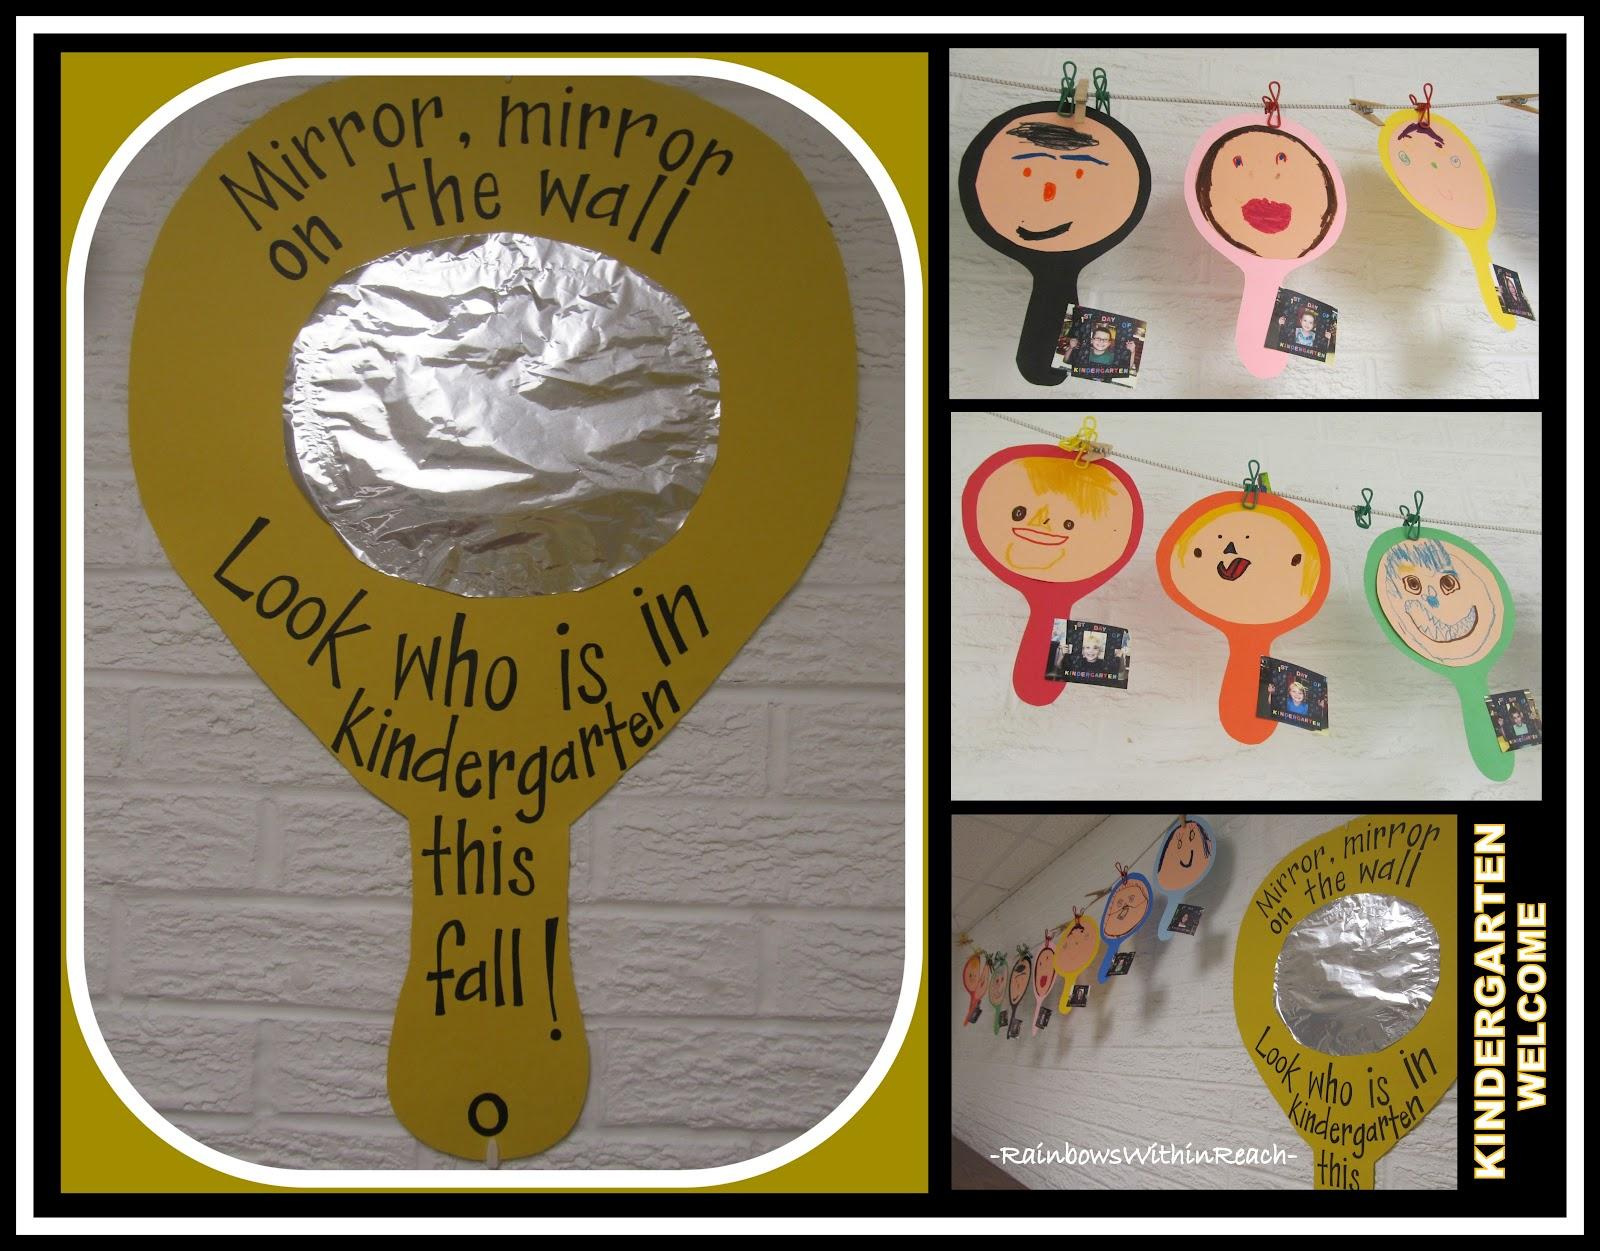 preschool bulletin board ideas for back to school www rainbowswithinreach 926